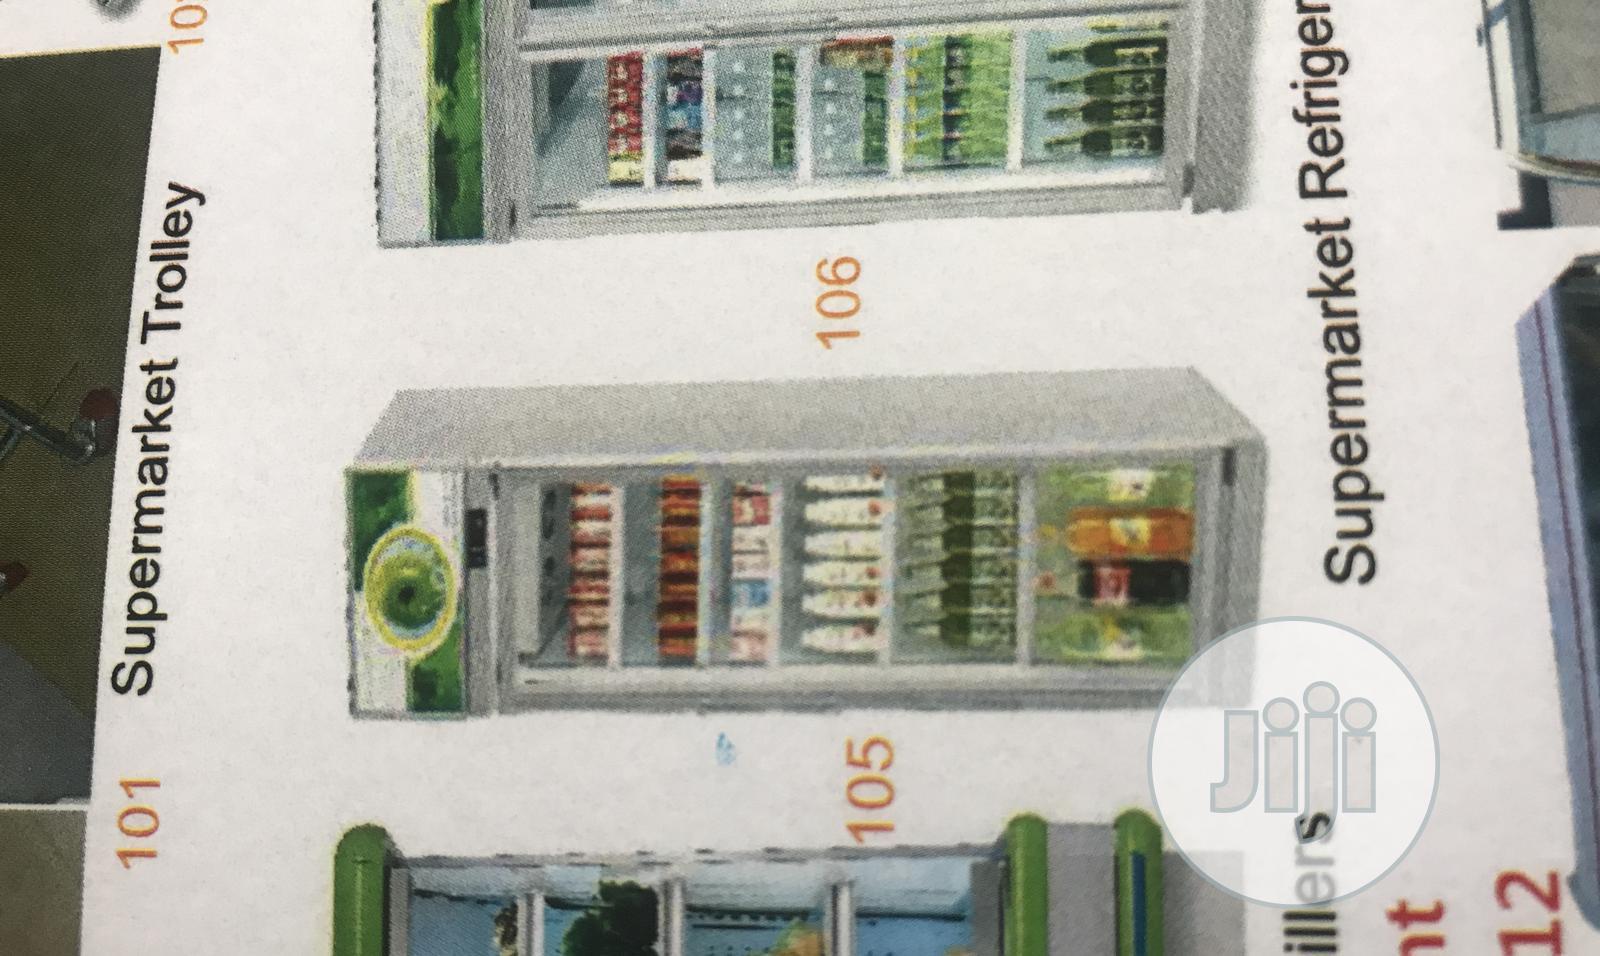 Archive: Supermarket Refrigerator